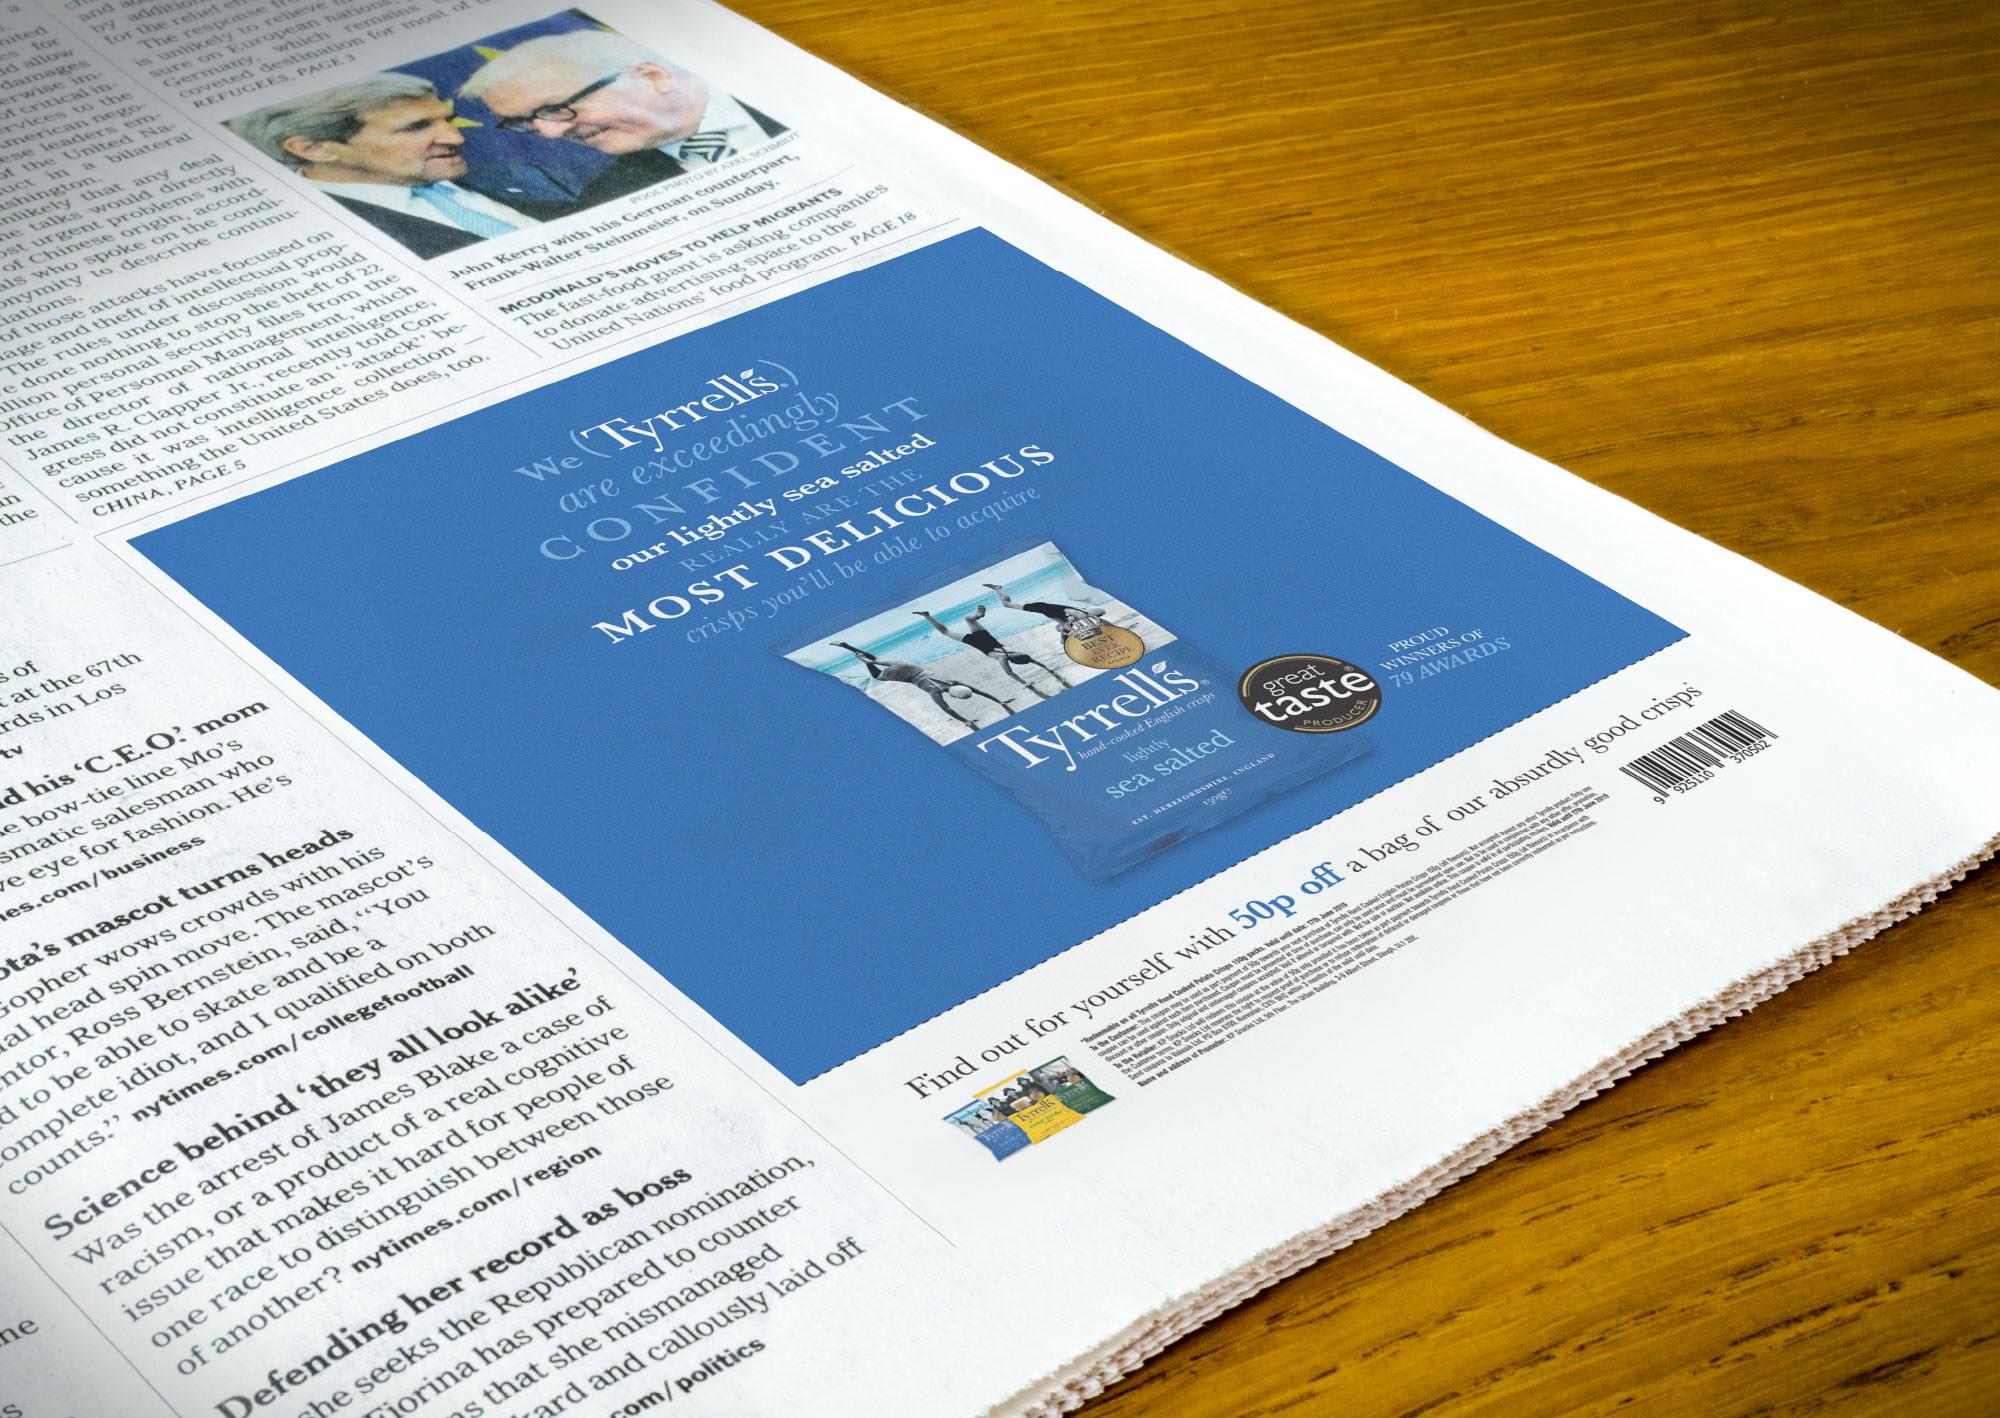 tyrrells-newspaper-ad2